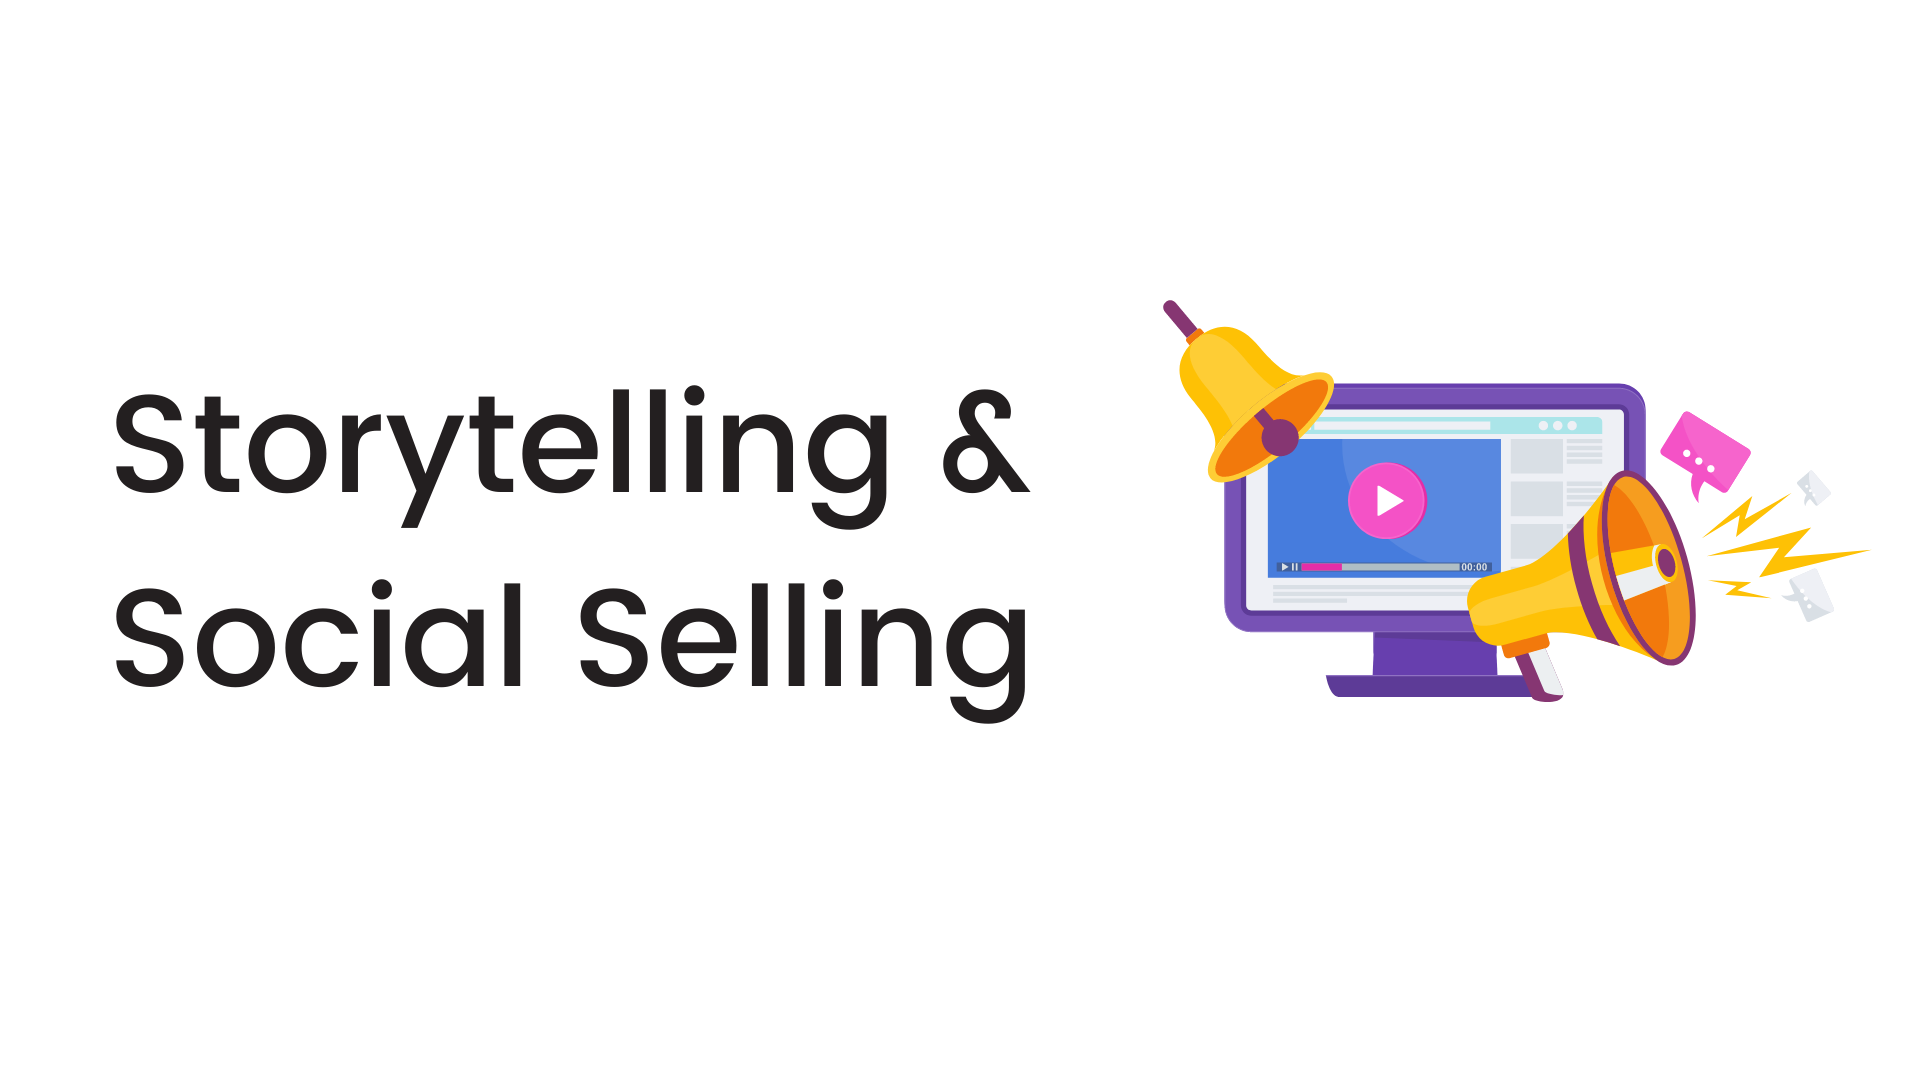 Digital_Coach_Academy_Personal_Branding_Architect_Storytelling_Social_Selling